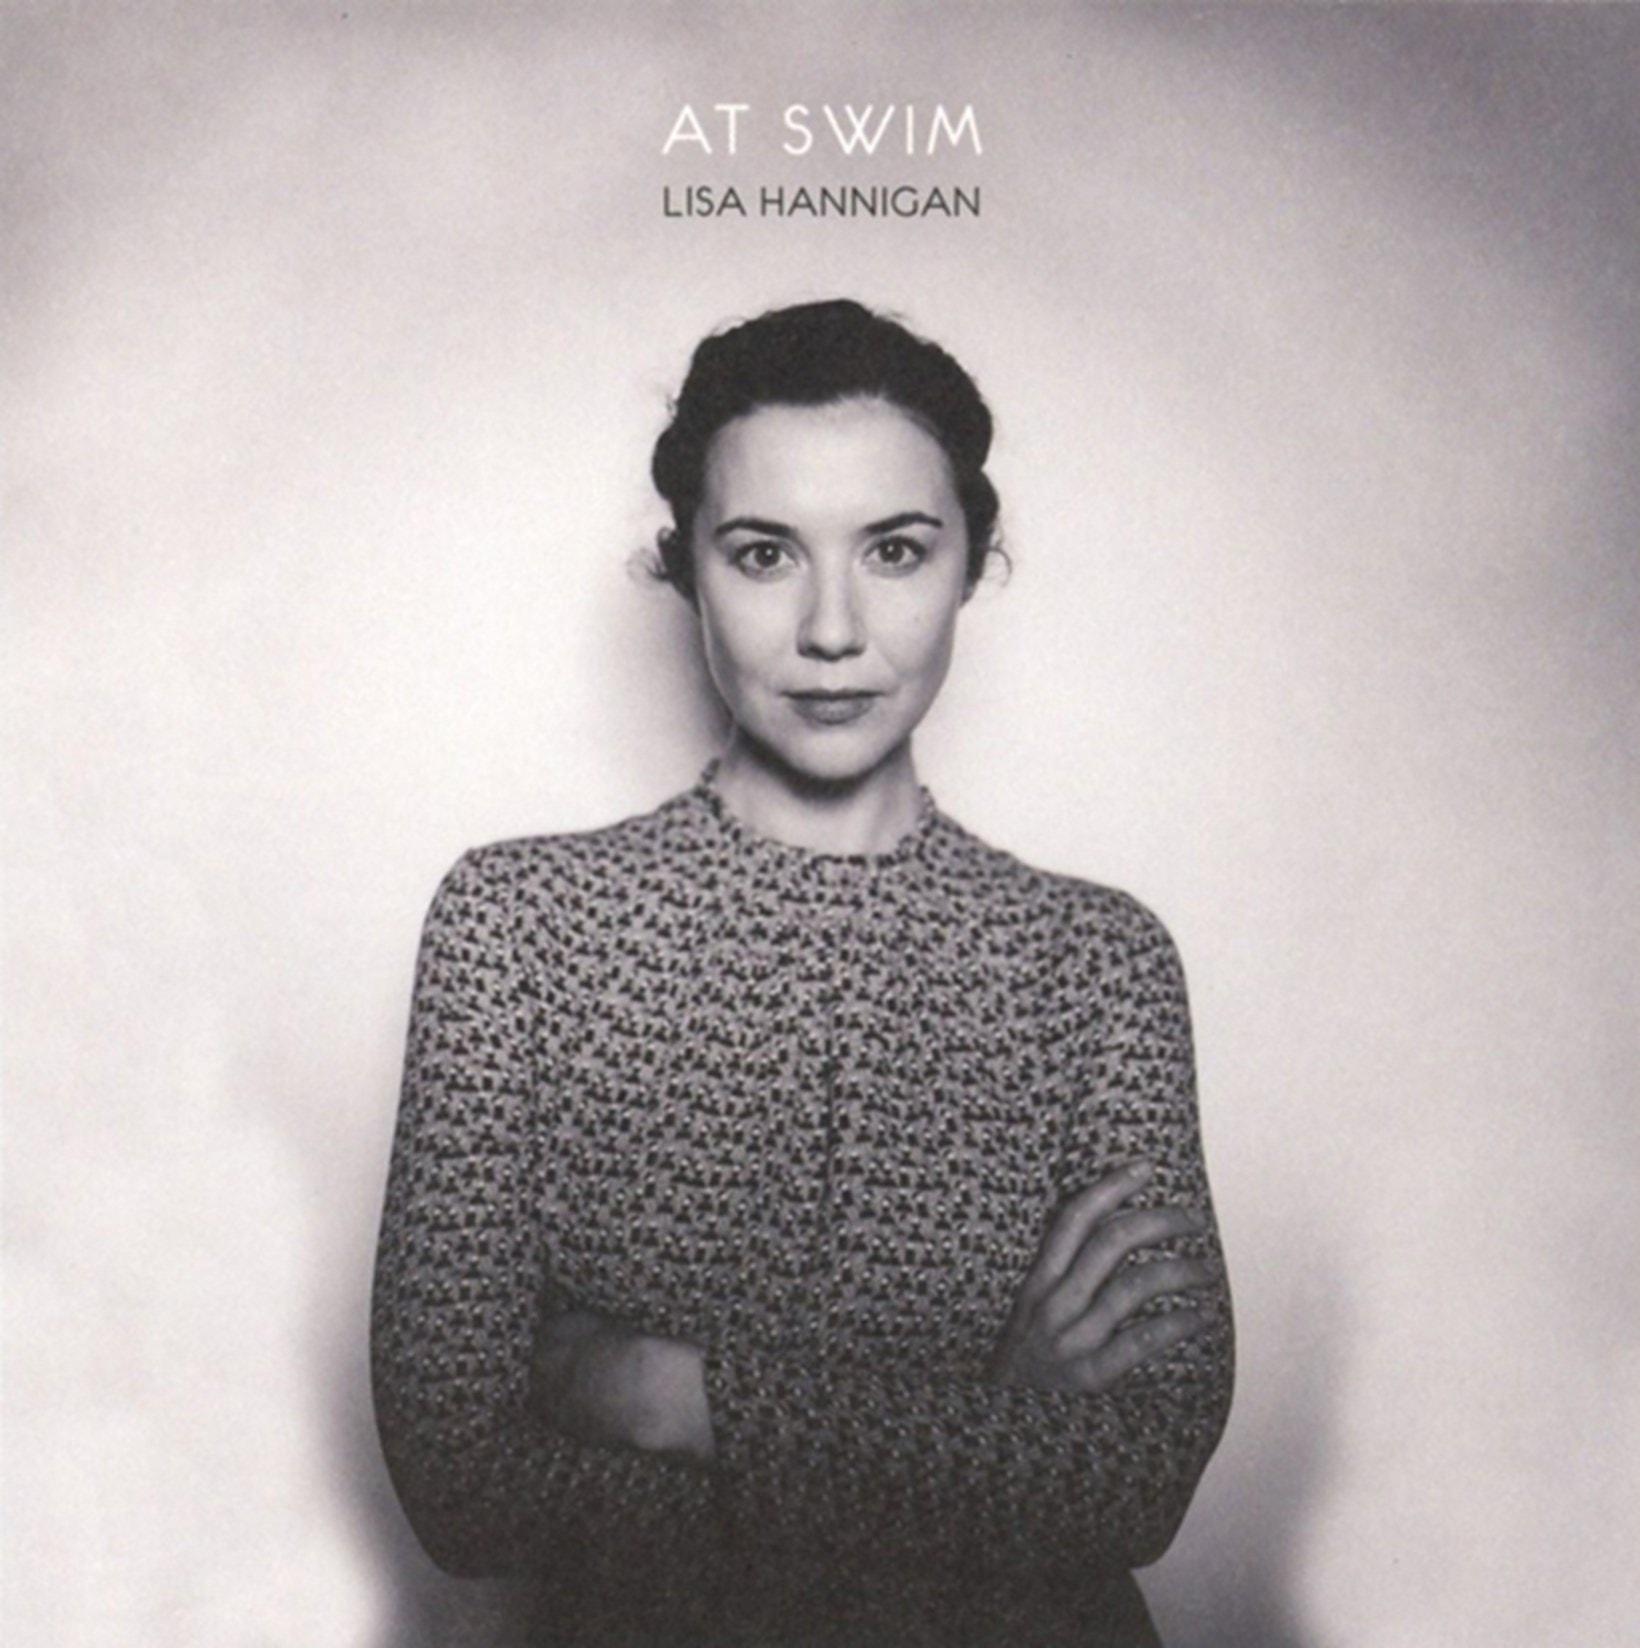 At Swim